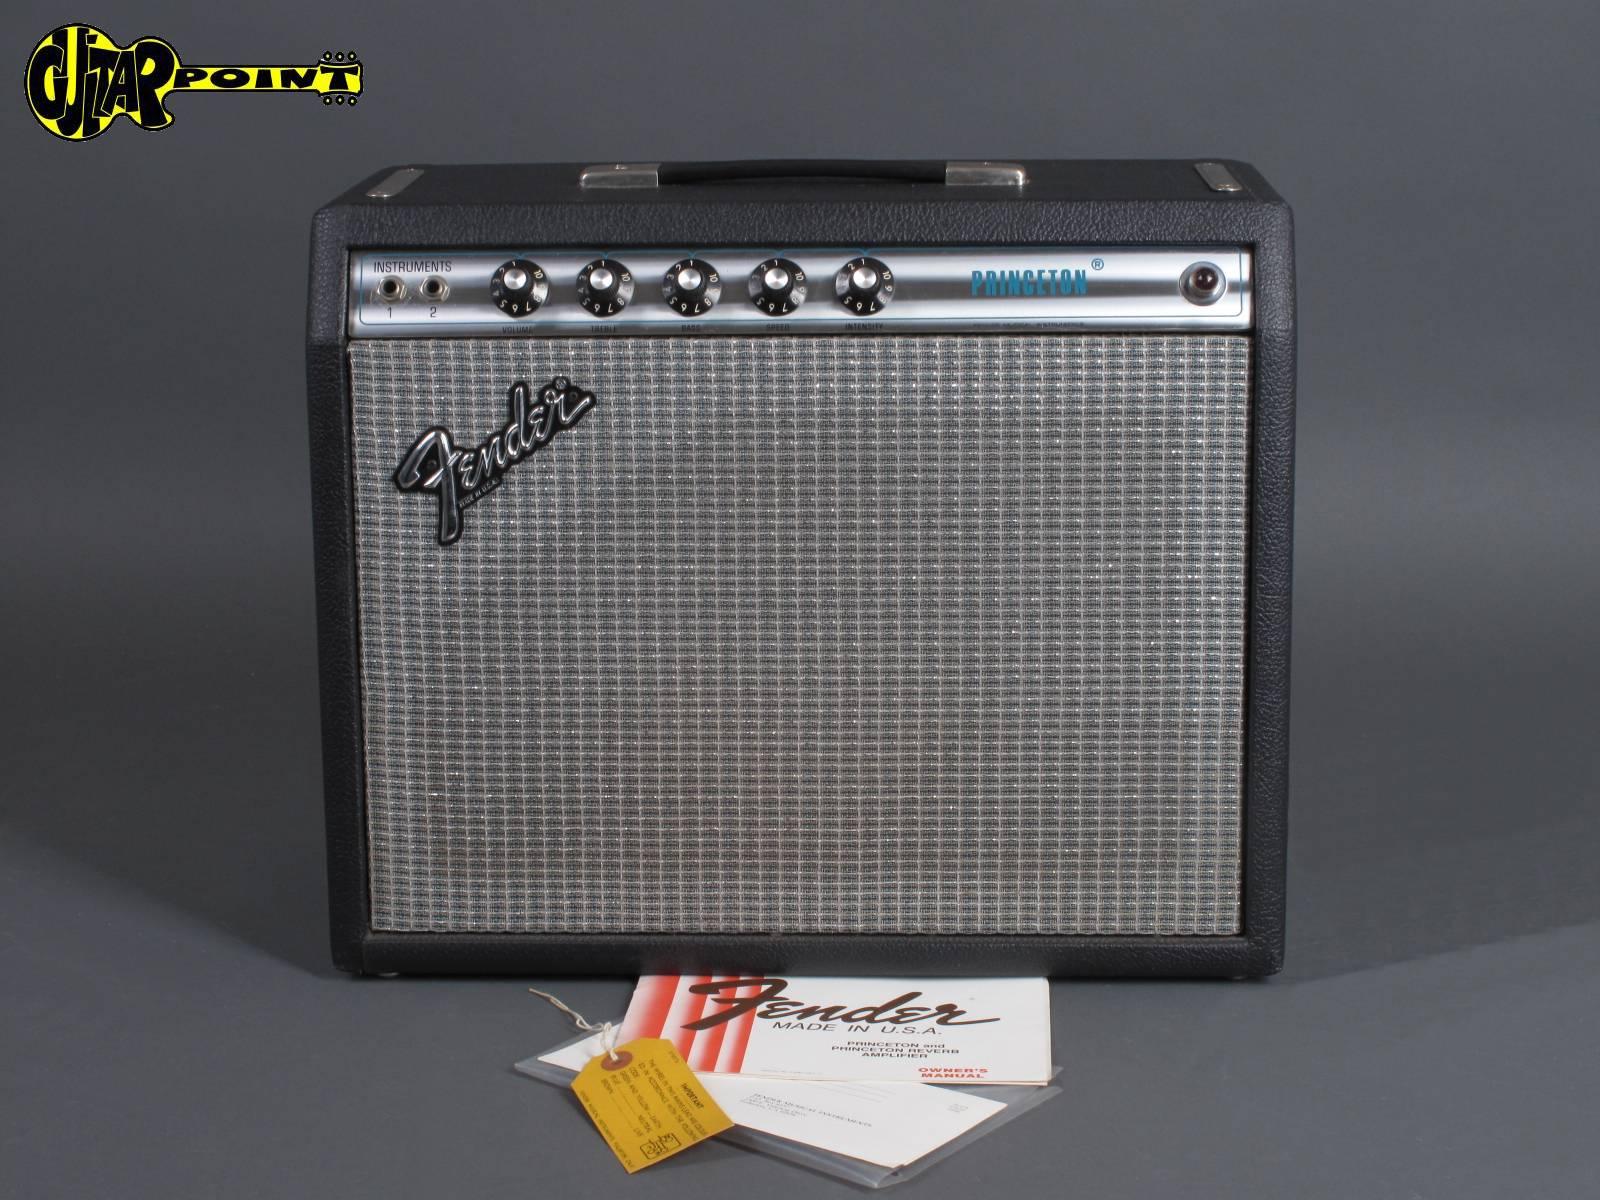 1979 Fender Princeton  Amp   -  Minty !!!